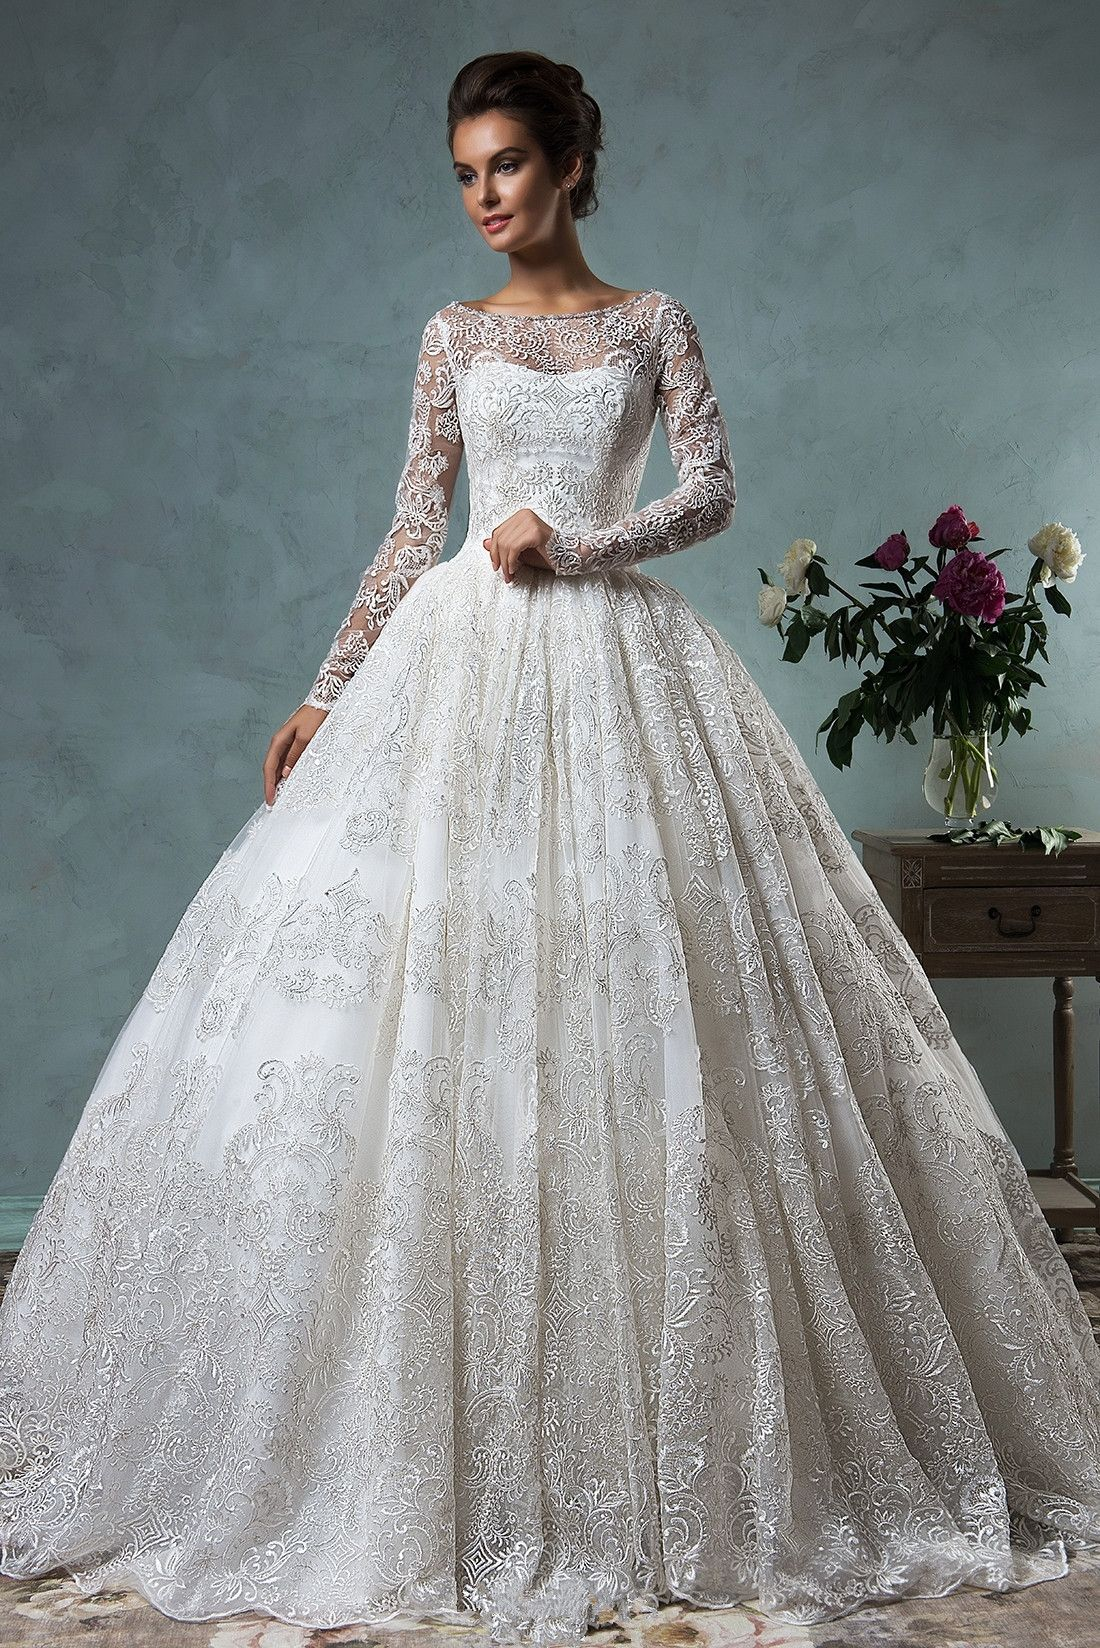 Delicate Lace Appliques Ball Gown Wedding Dress 2016 Zipper Button ...